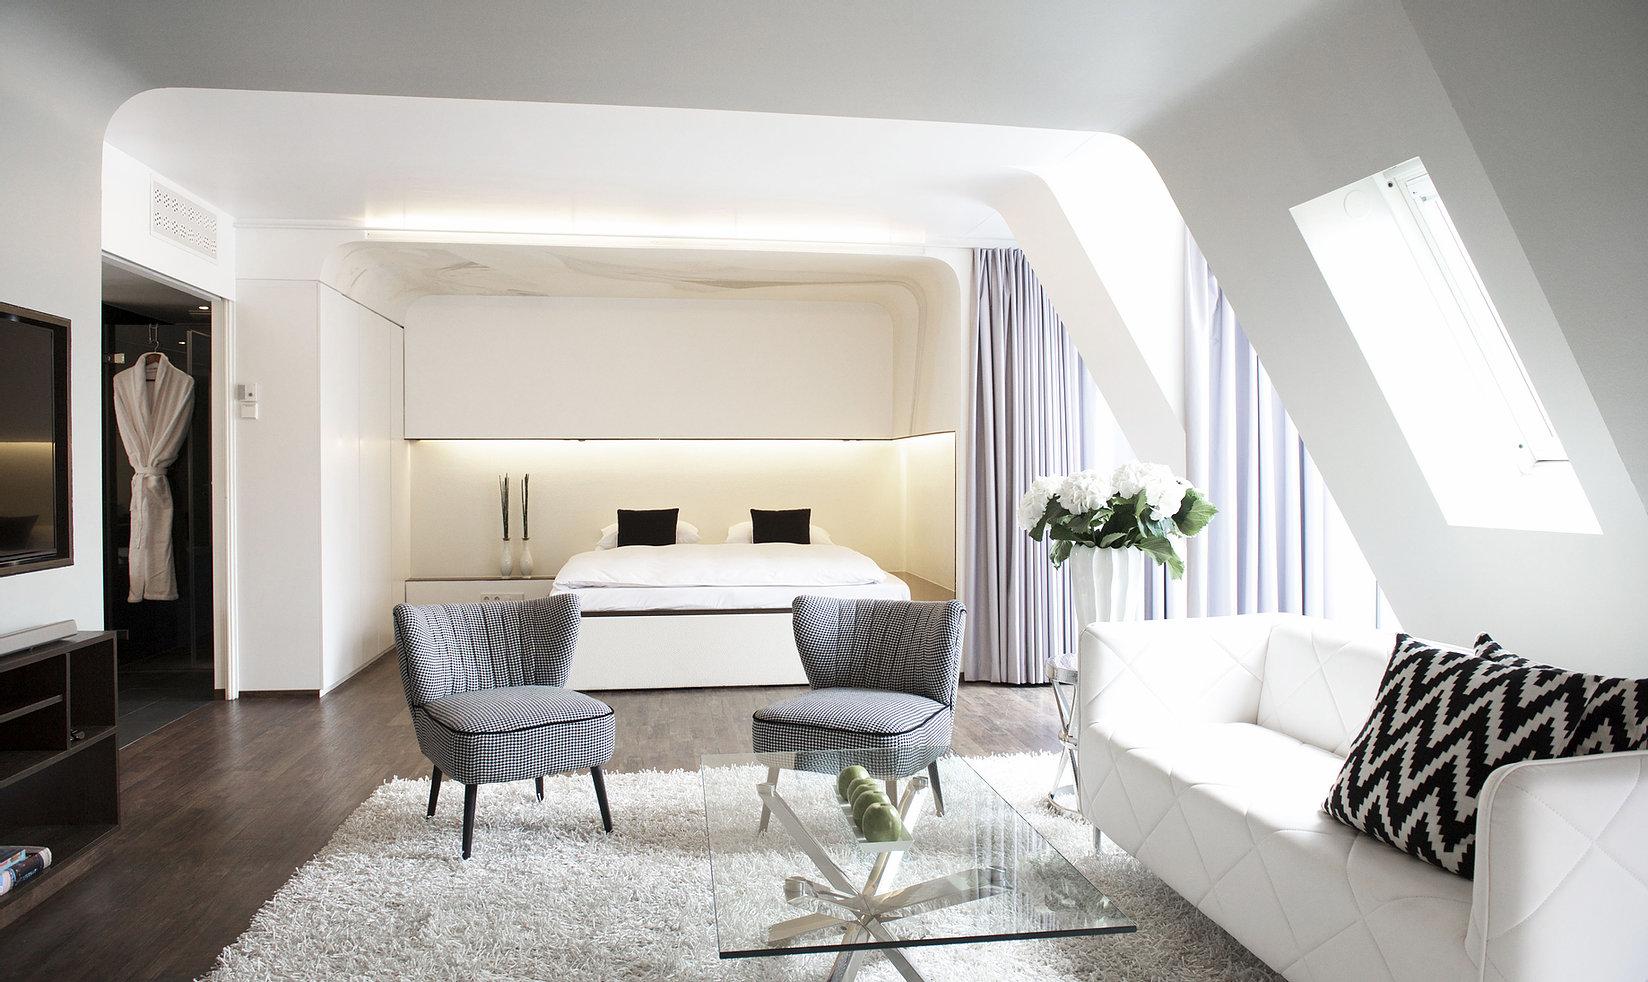 Hotel Q Berlin design concept room of this unique hotels in berlin